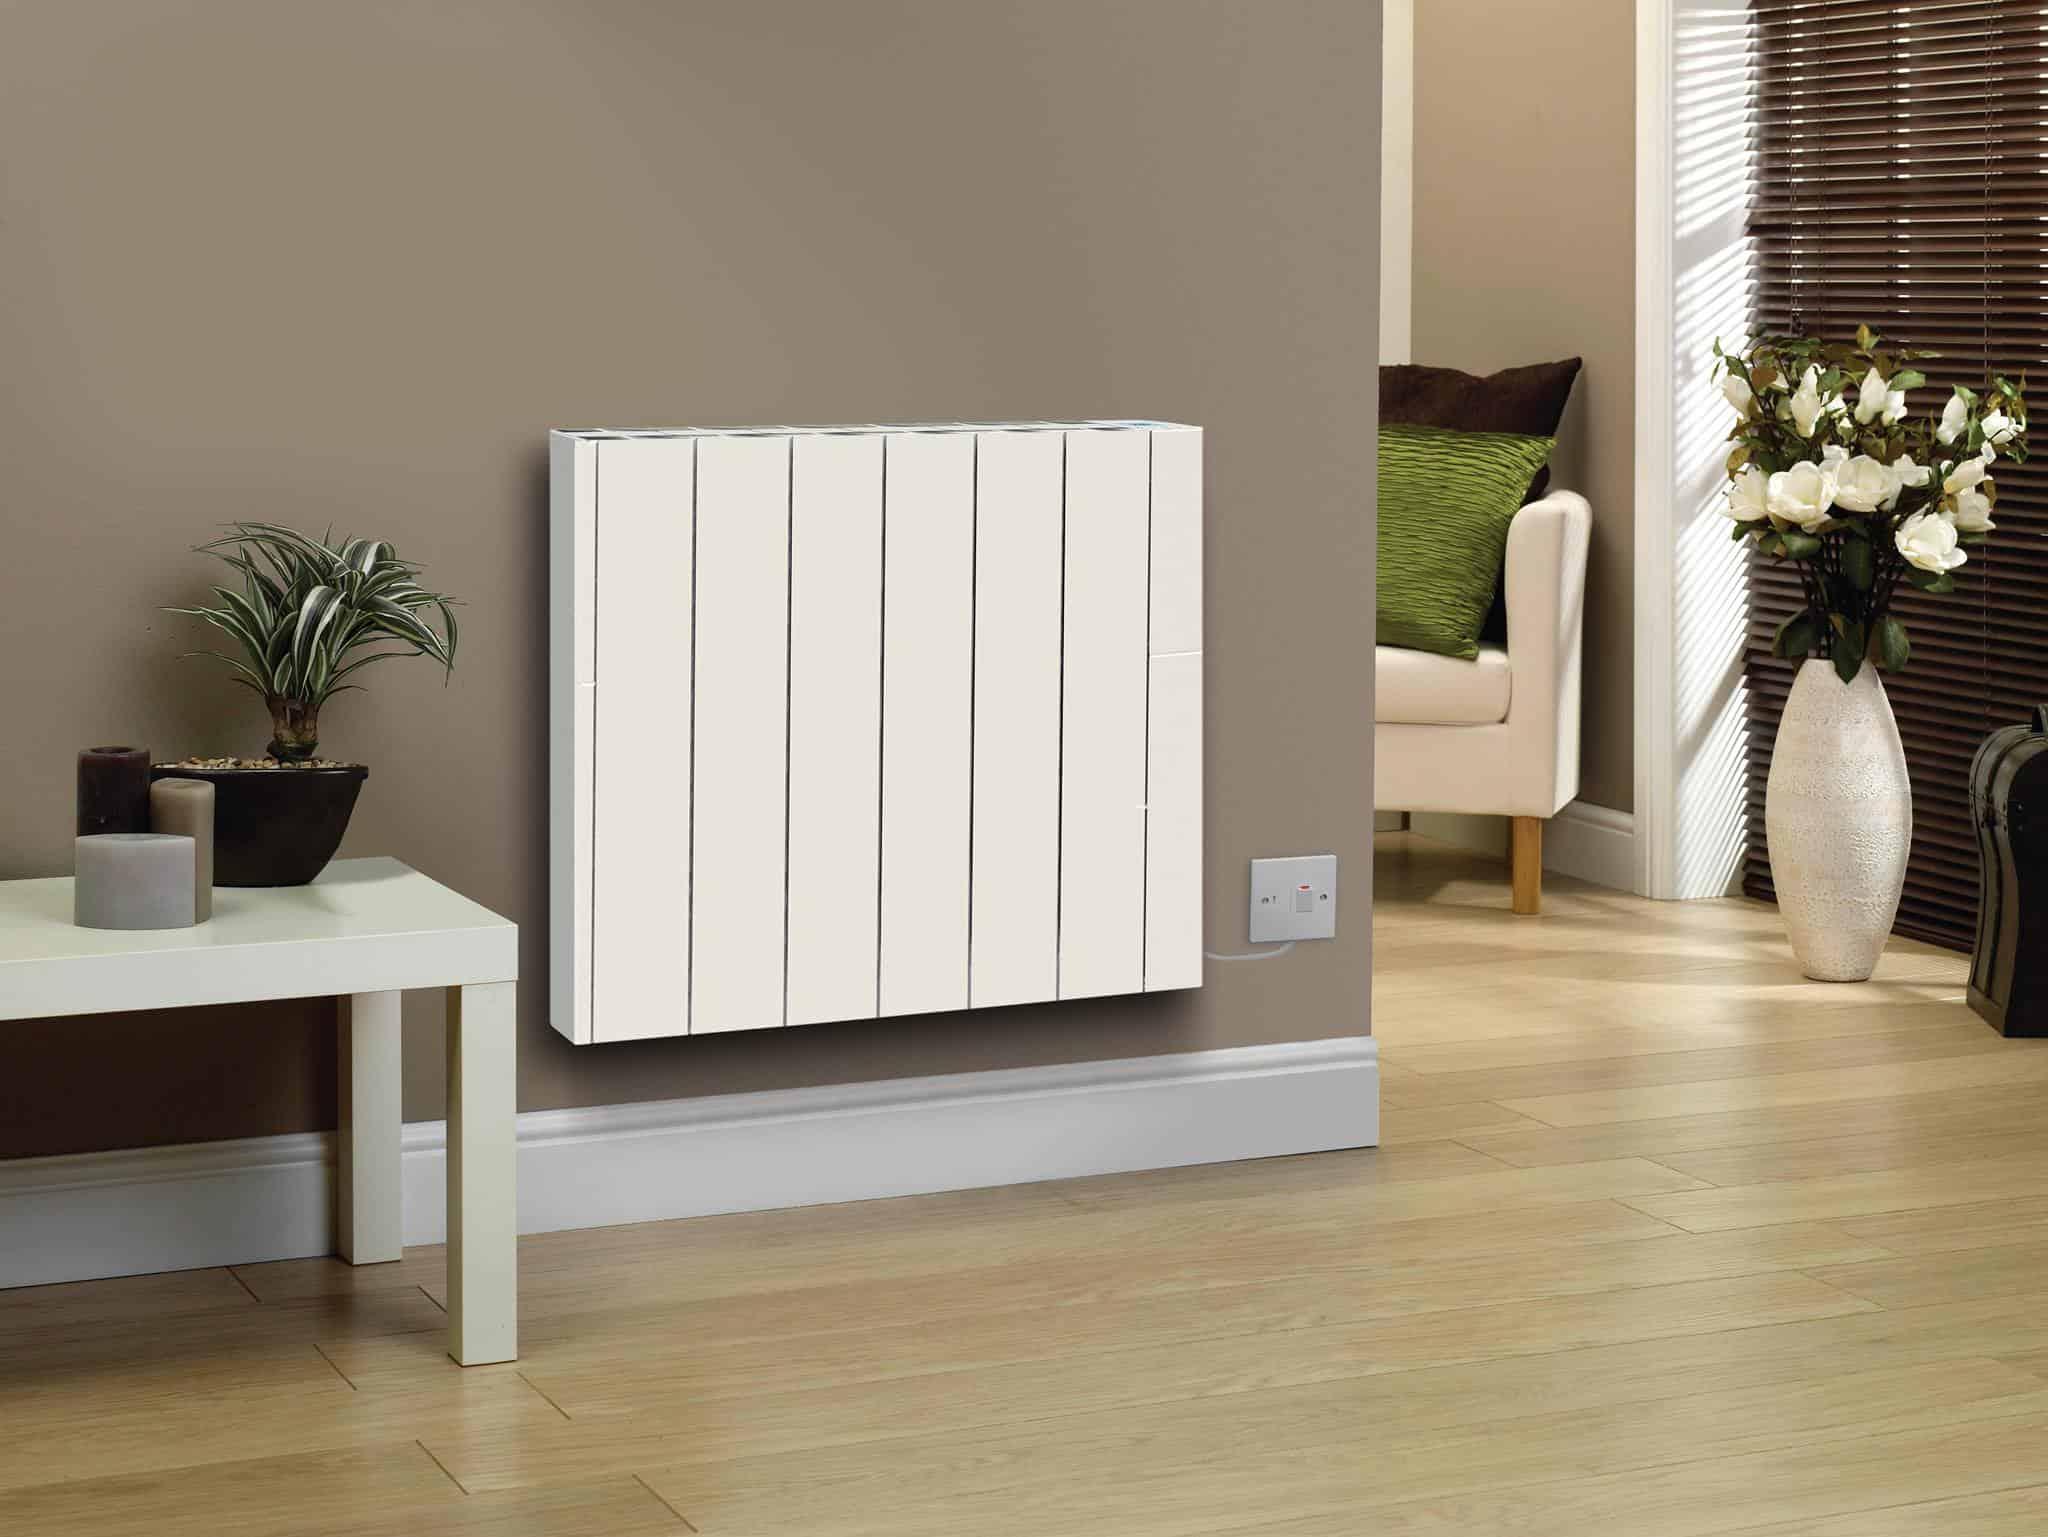 Electric Heating Fife Boilers Radiators Storage